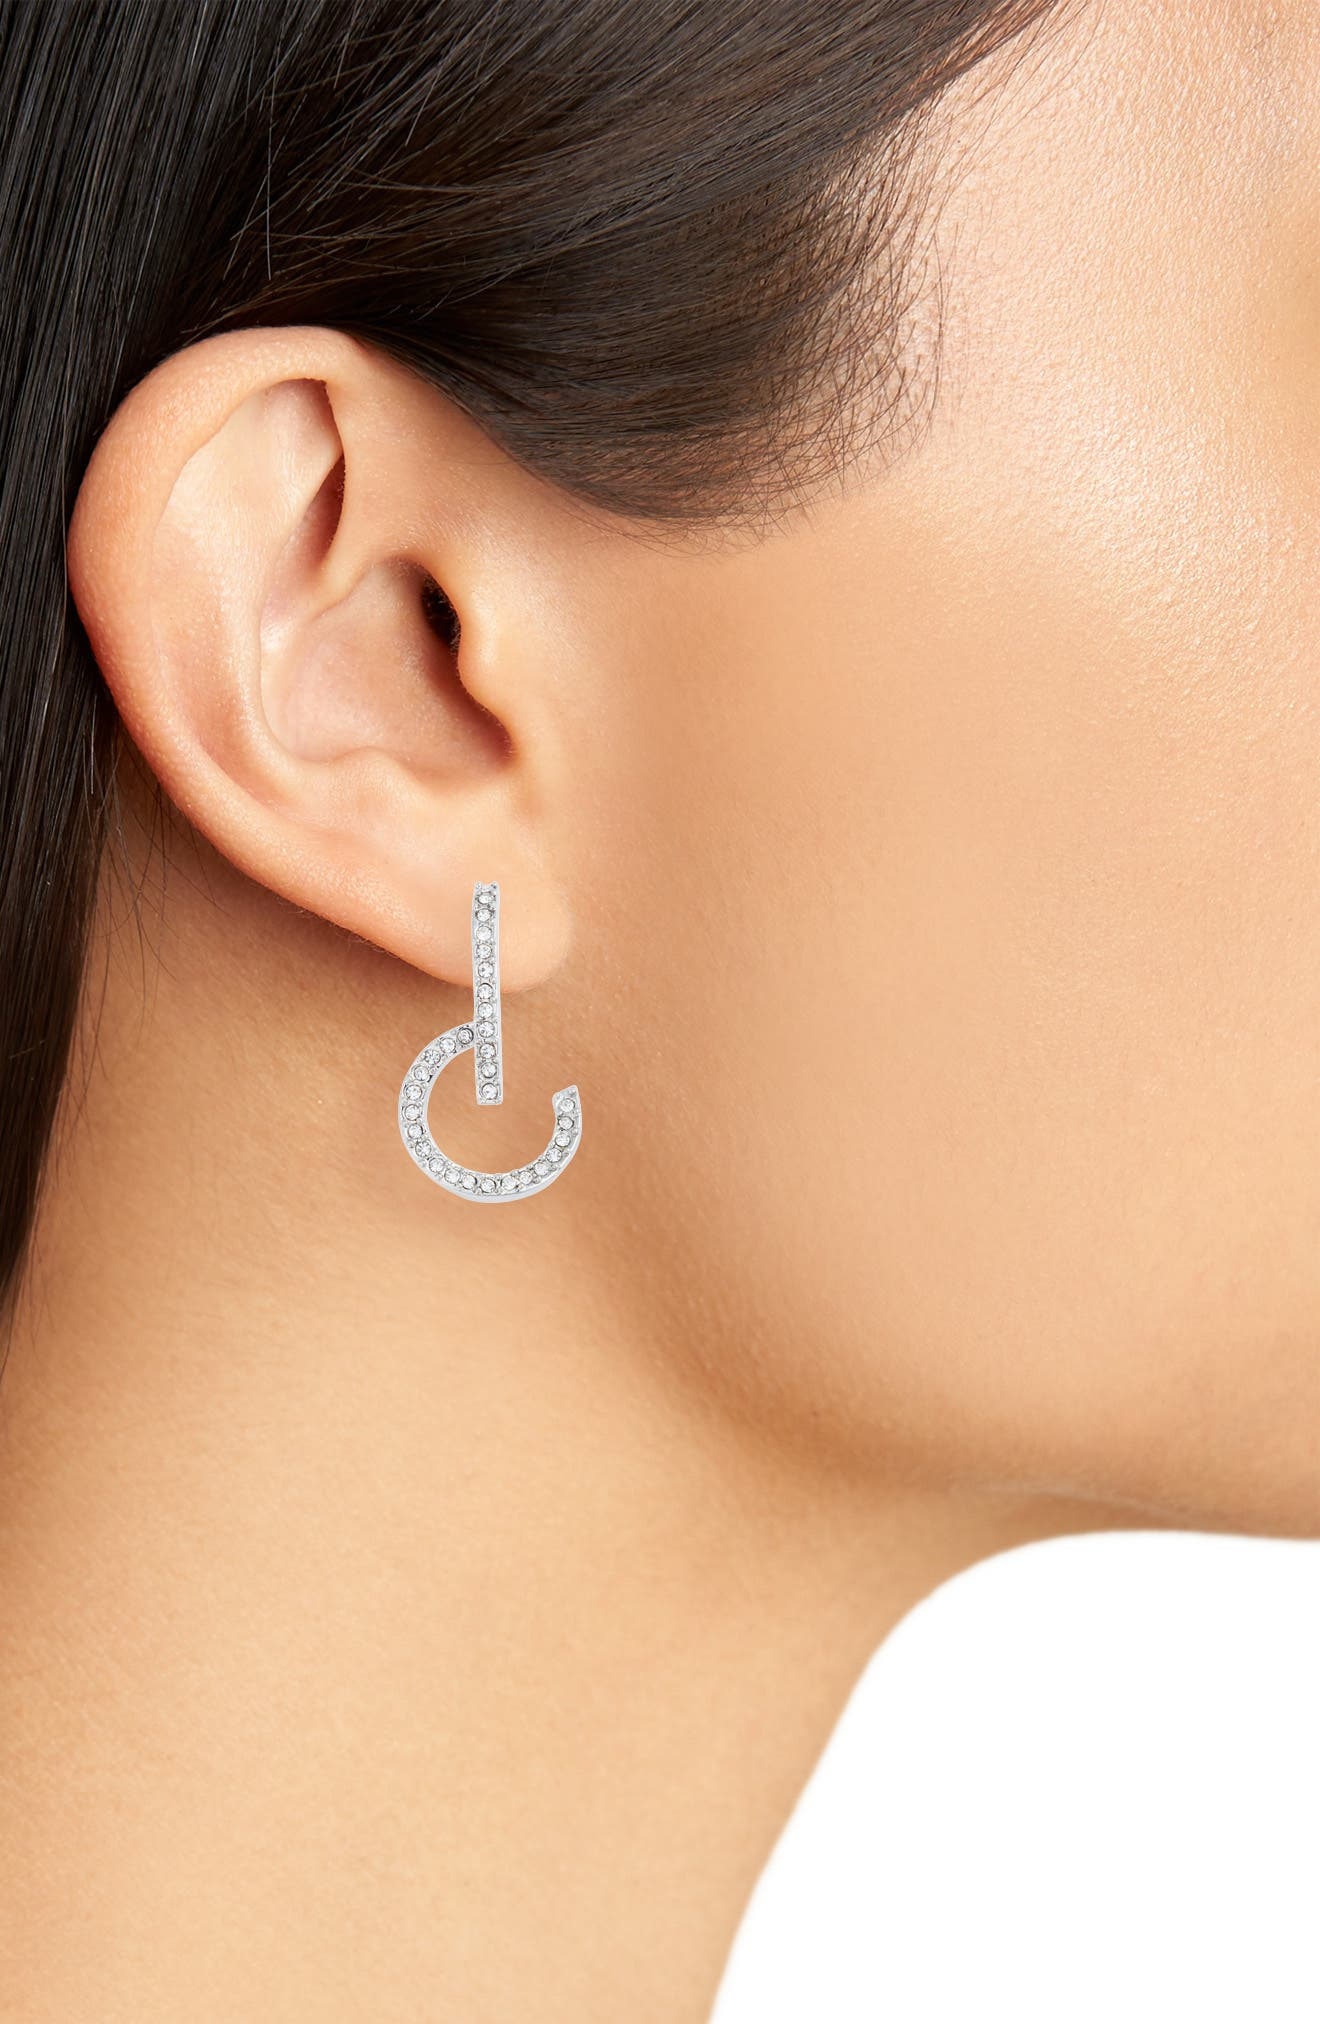 Lobe and Hoop Earrings,                             Alternate thumbnail 2, color,                             040